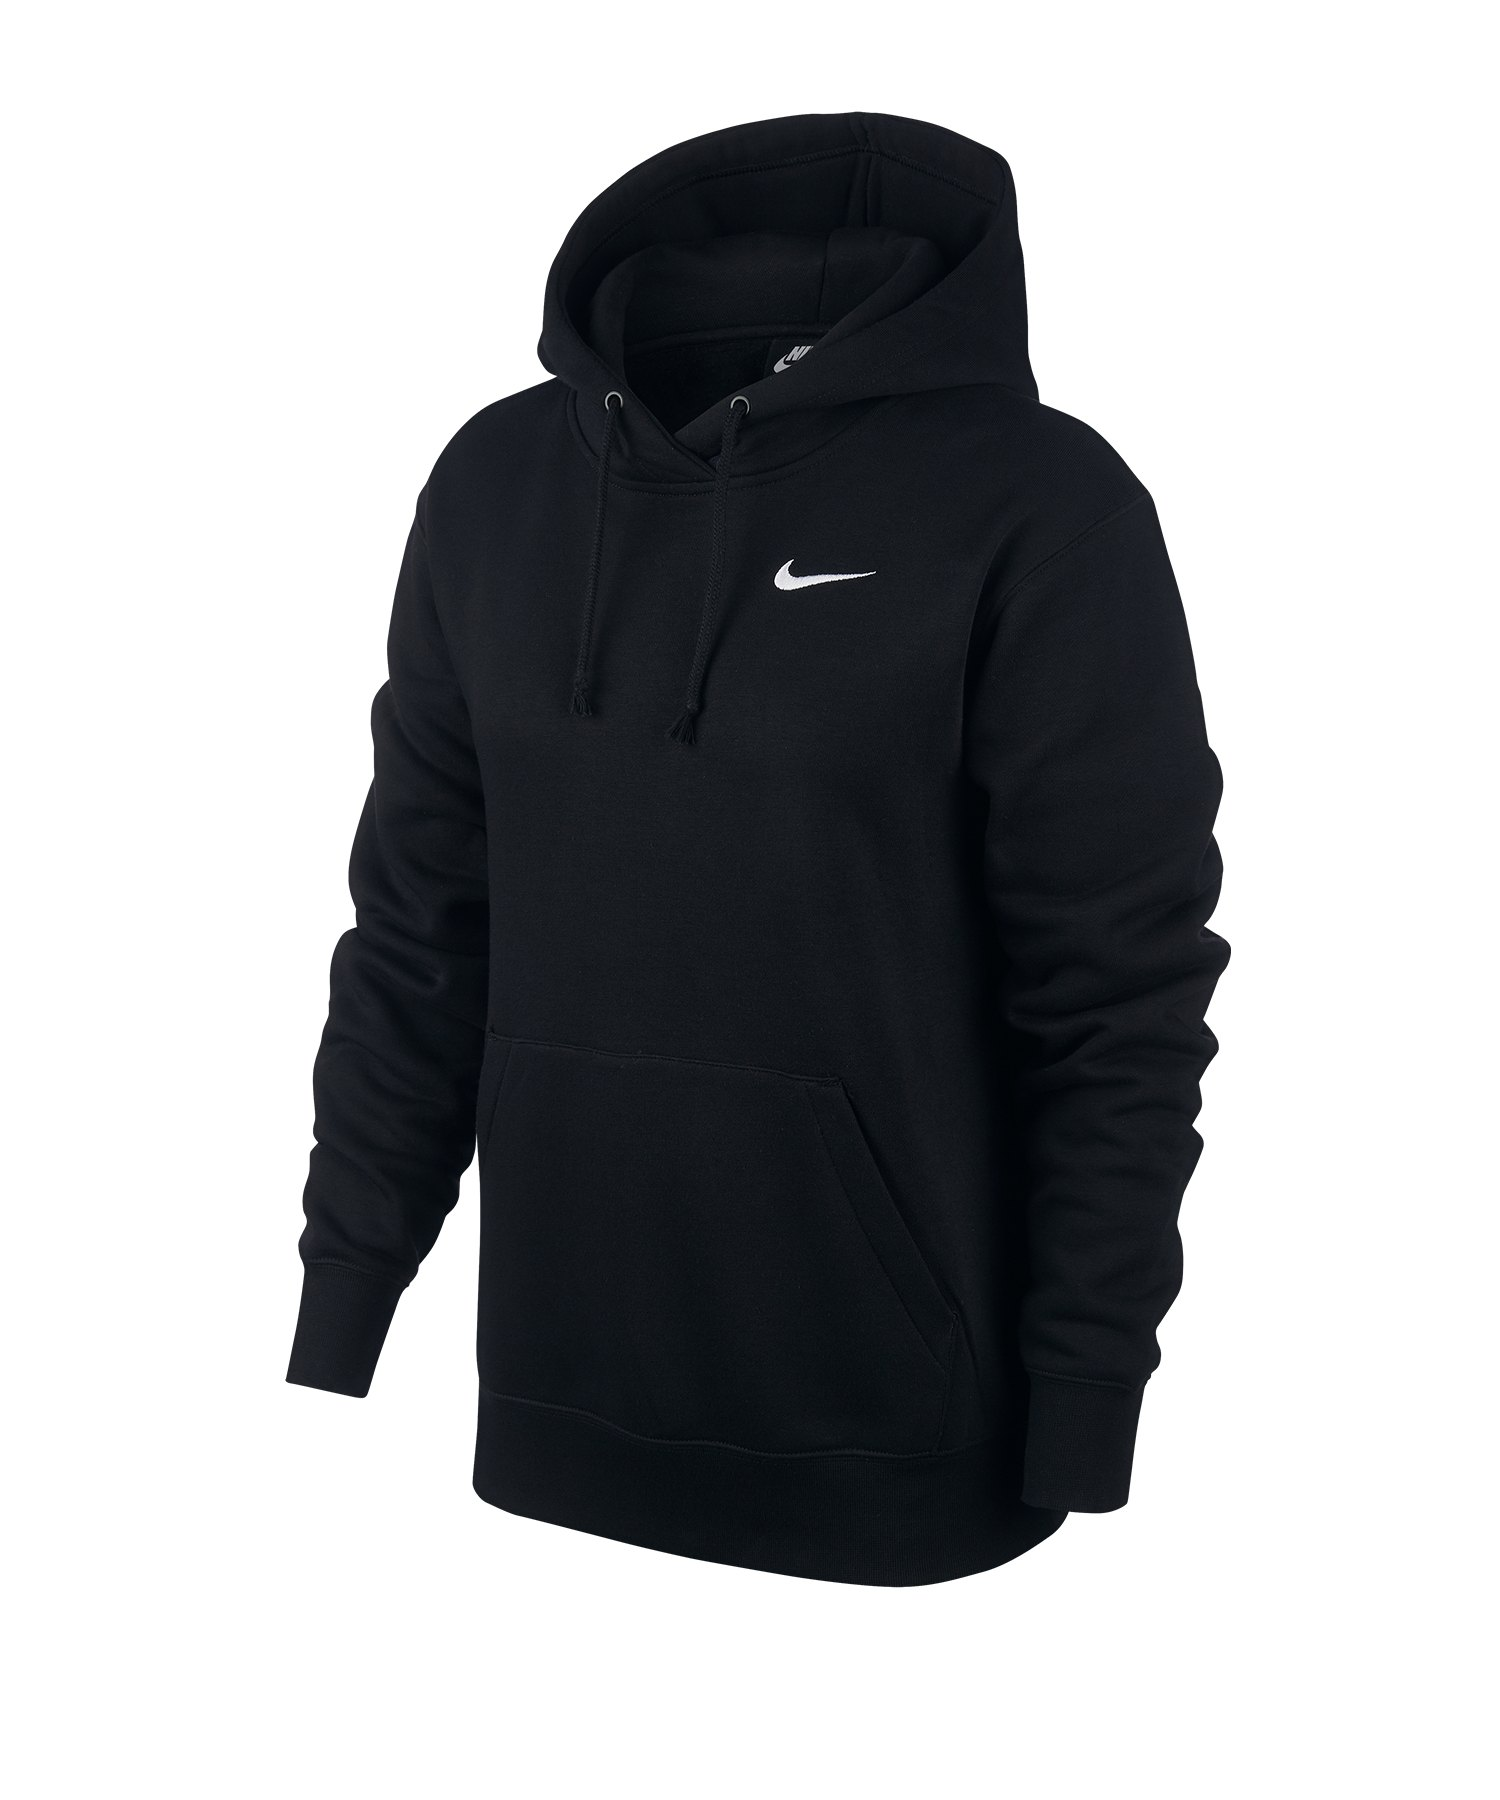 Nike Essential Hoody Damen Schwarz Weiss F010